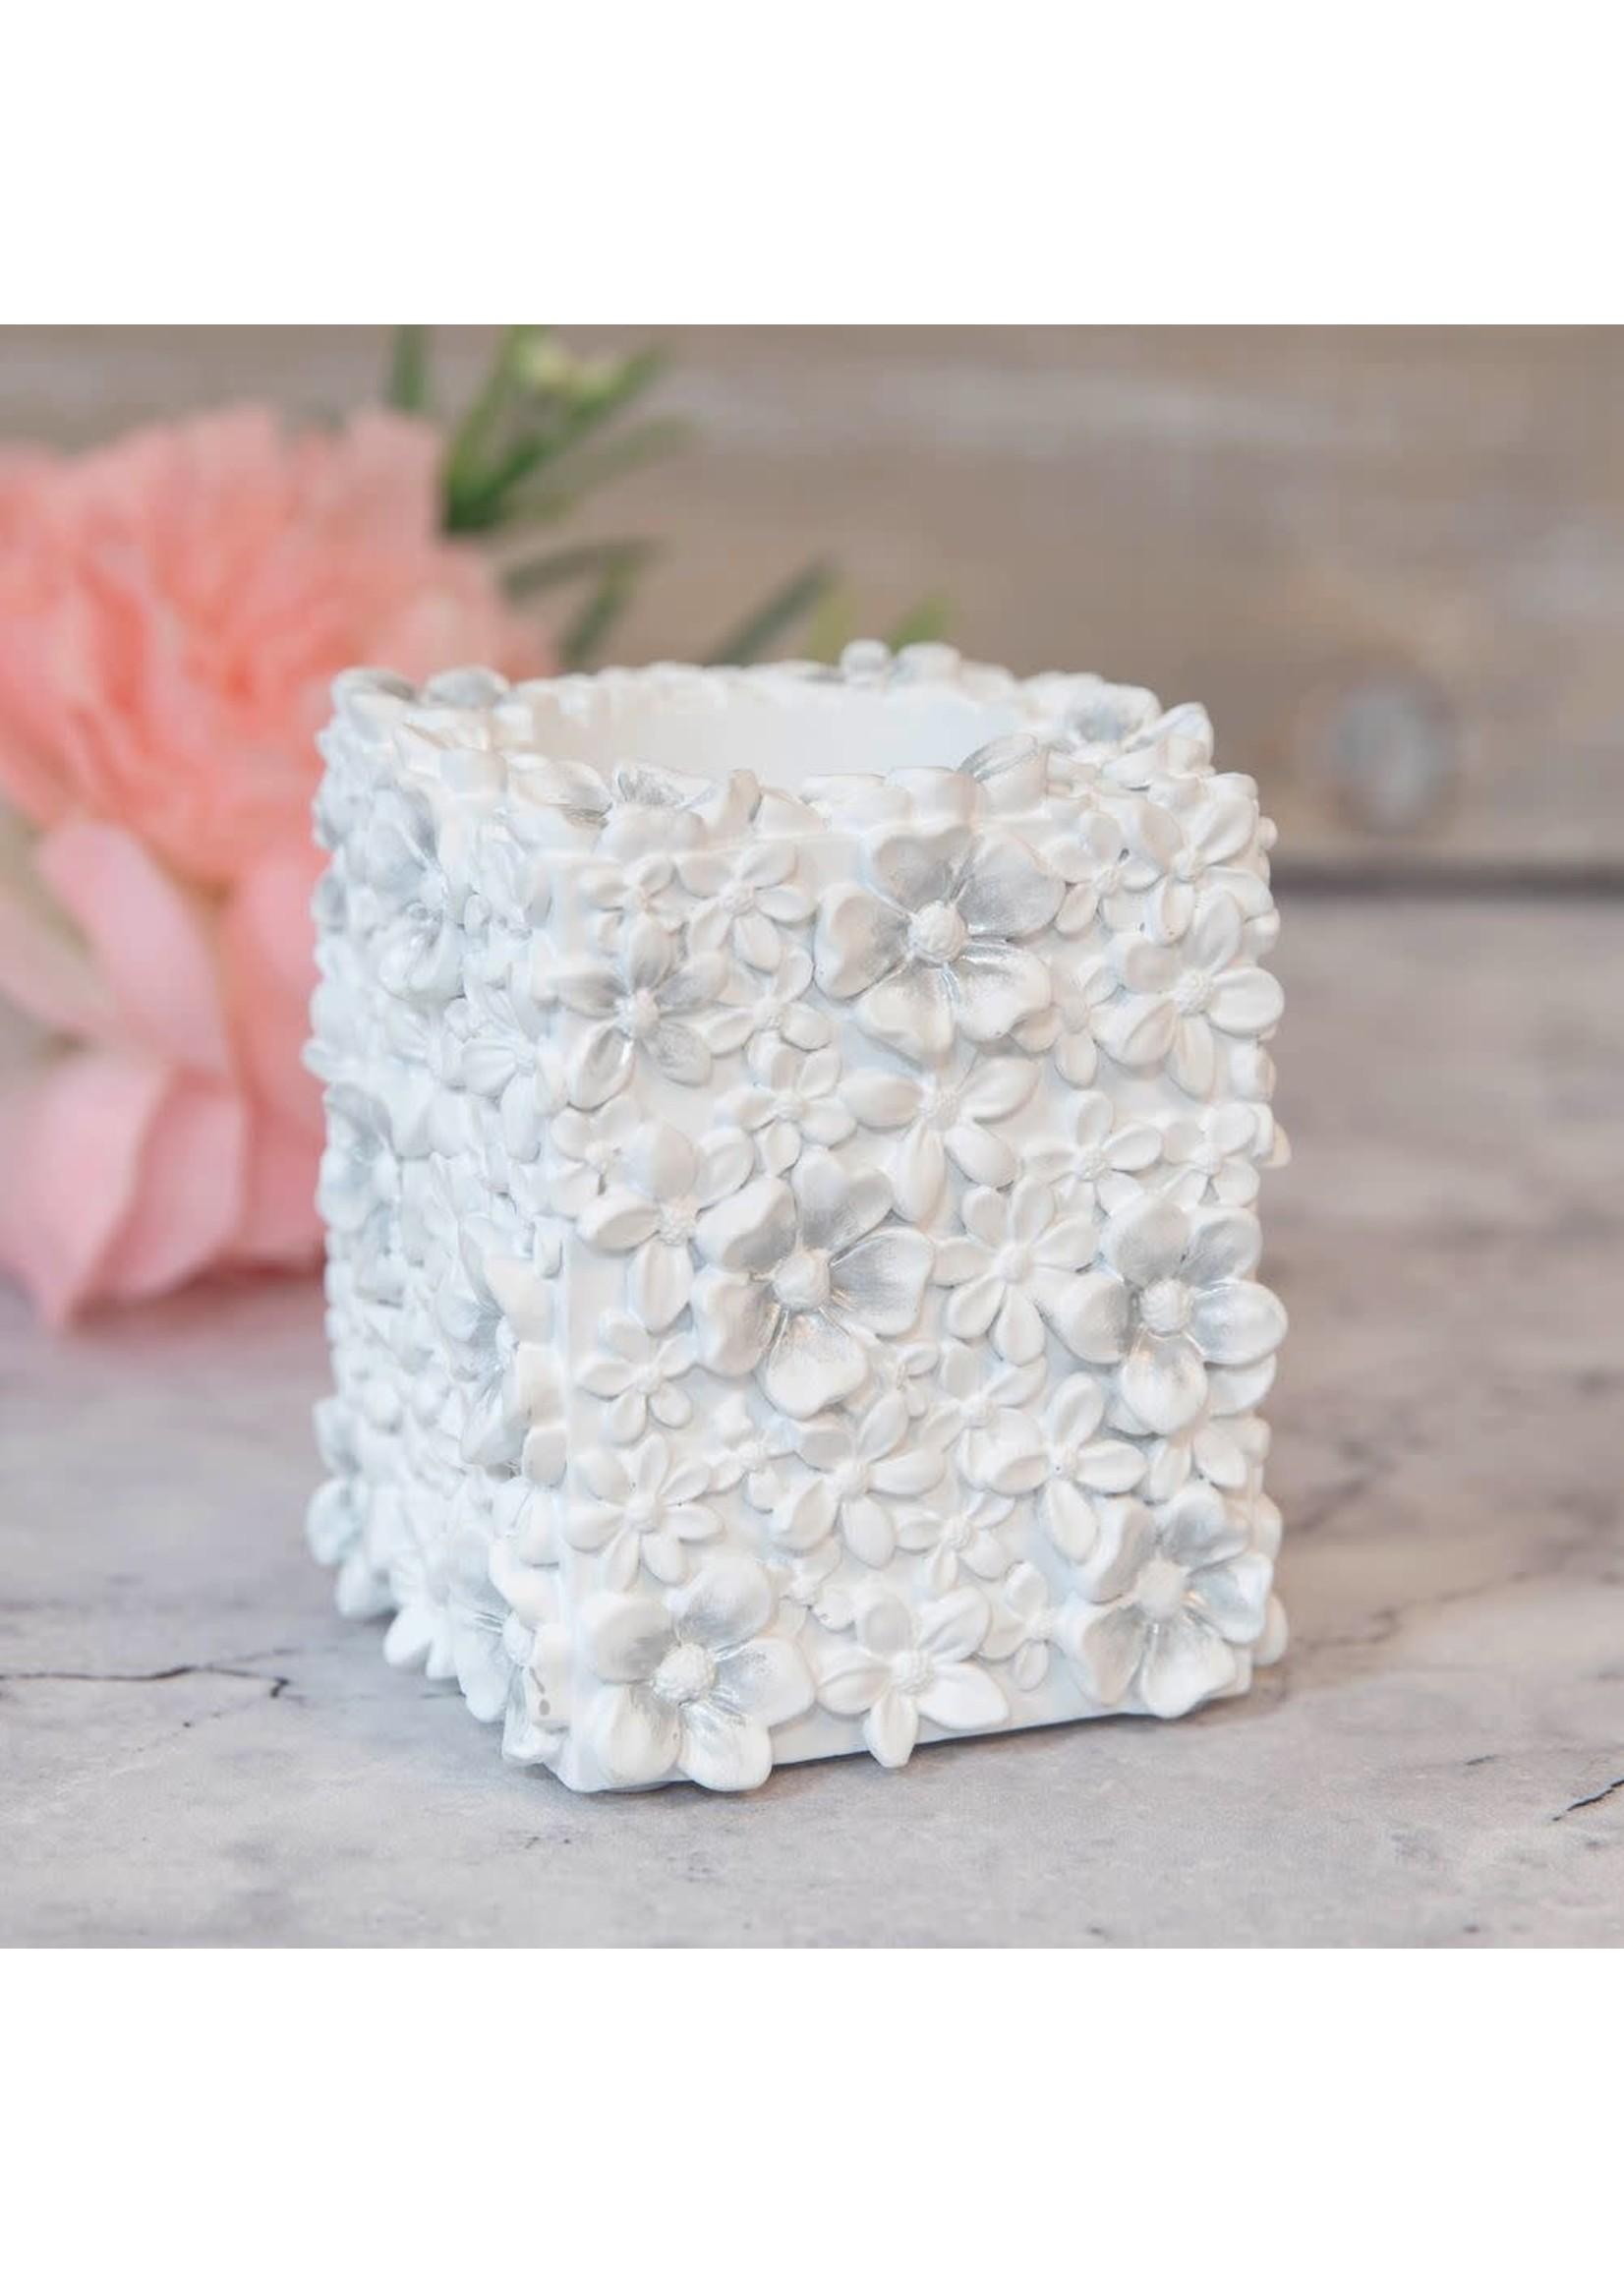 SOPHIA® WHITE FLORAL RESIN TEALIGHT CANDLE HOLDER